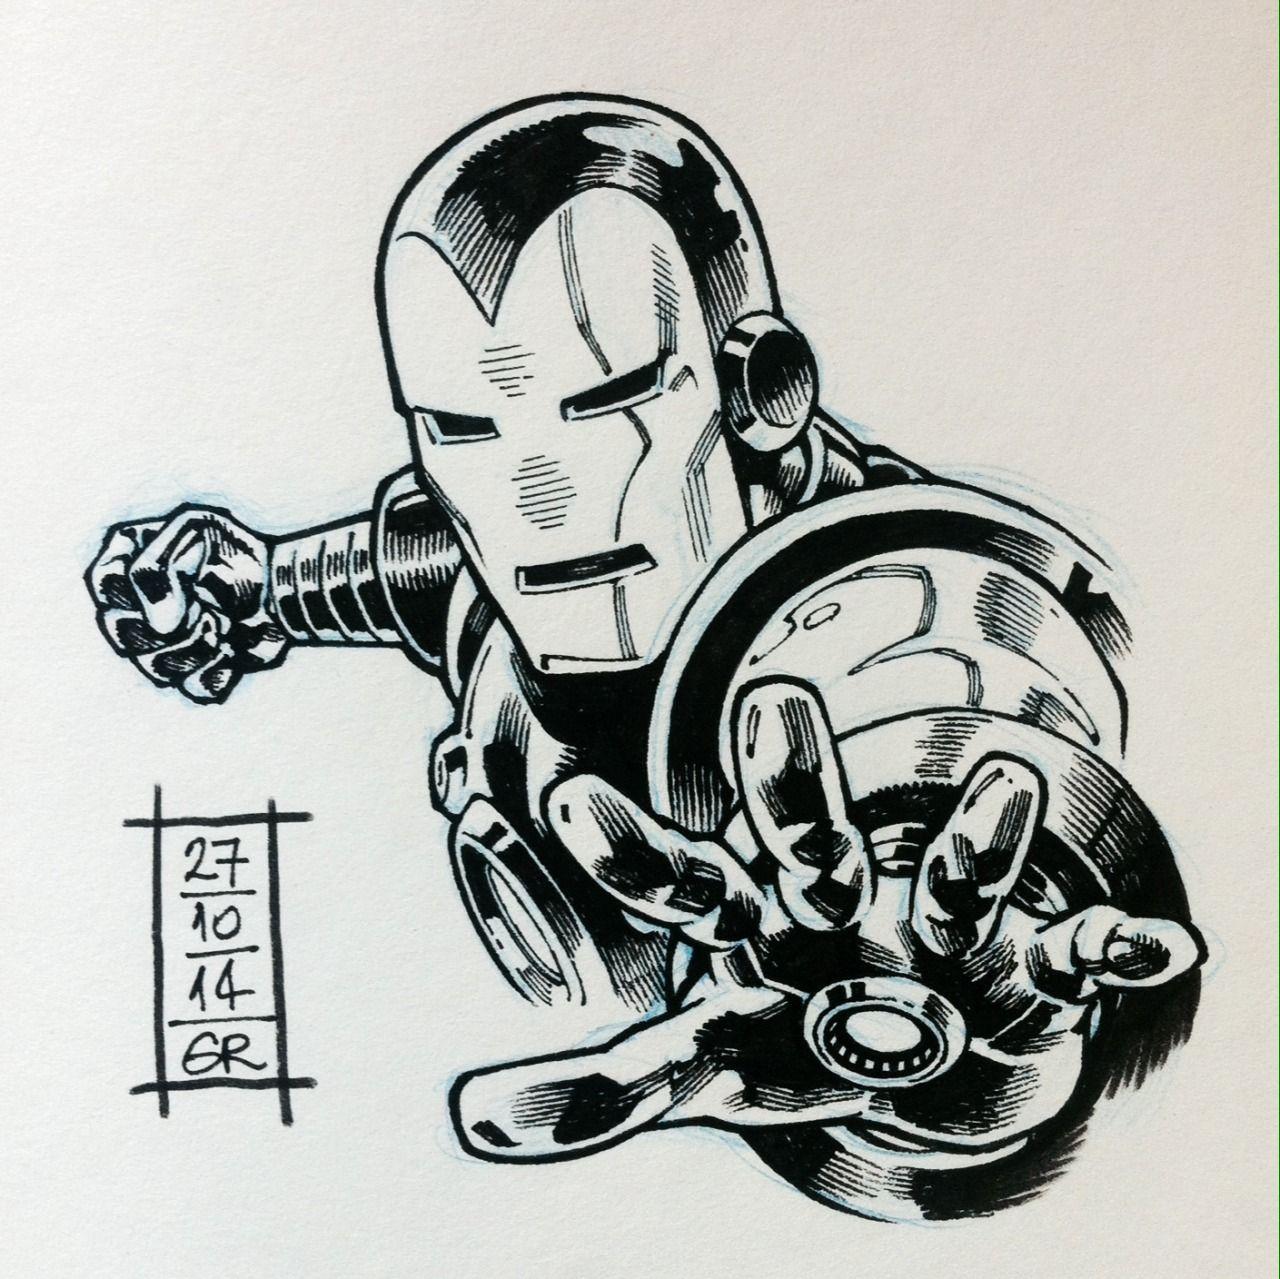 #Inktober batch 5: Iron Man (70's), Swamp Thing, Felix The Cat, Black Bolt and Dodge